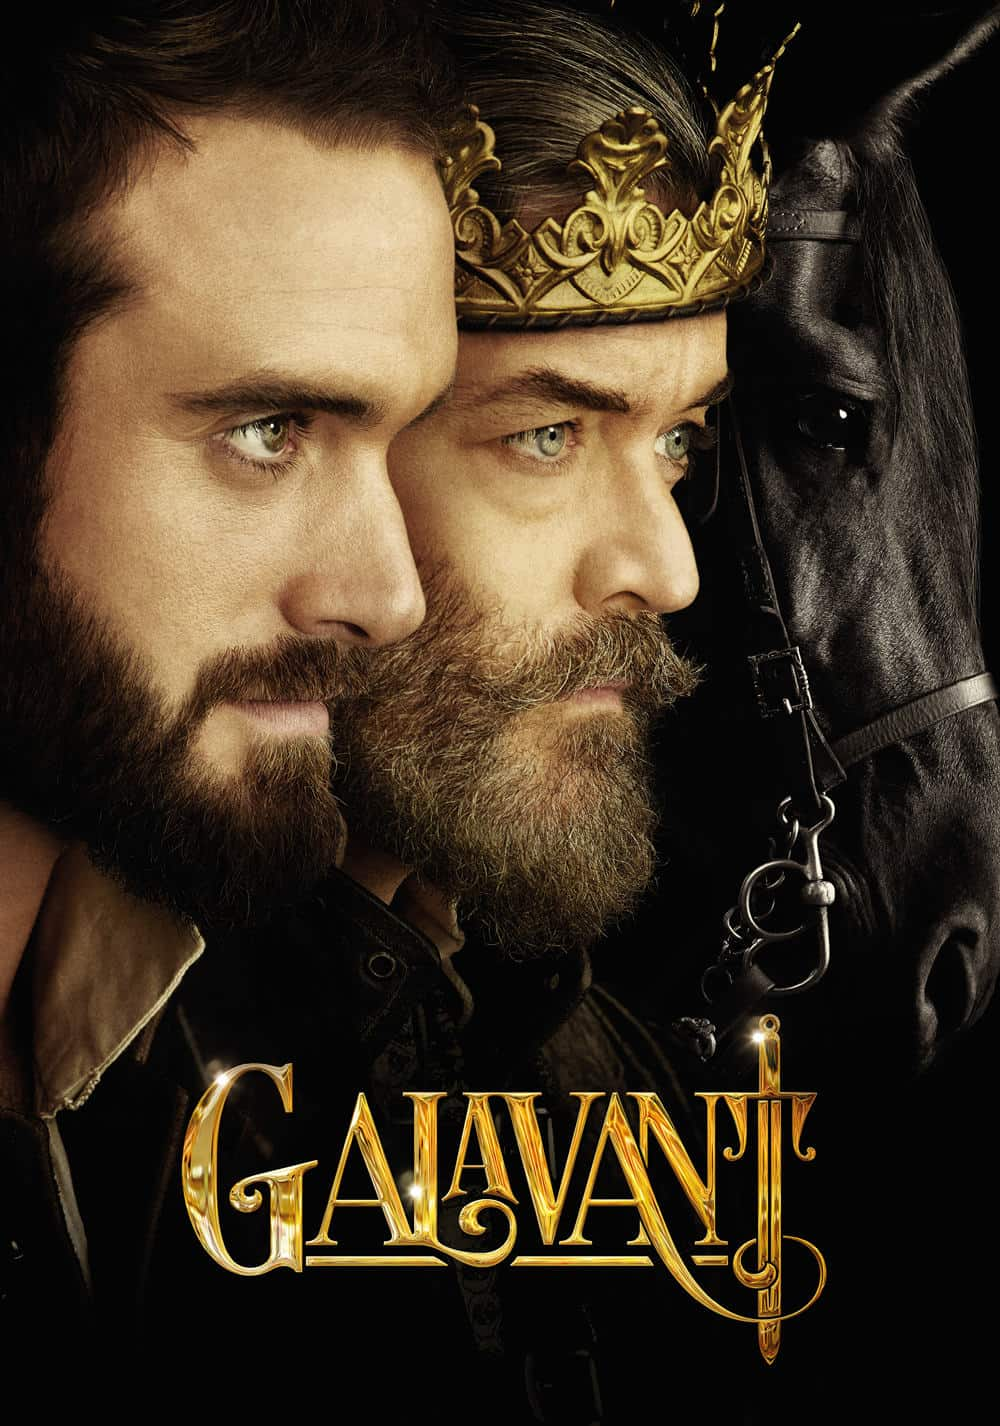 galavant-567947cdf31d2